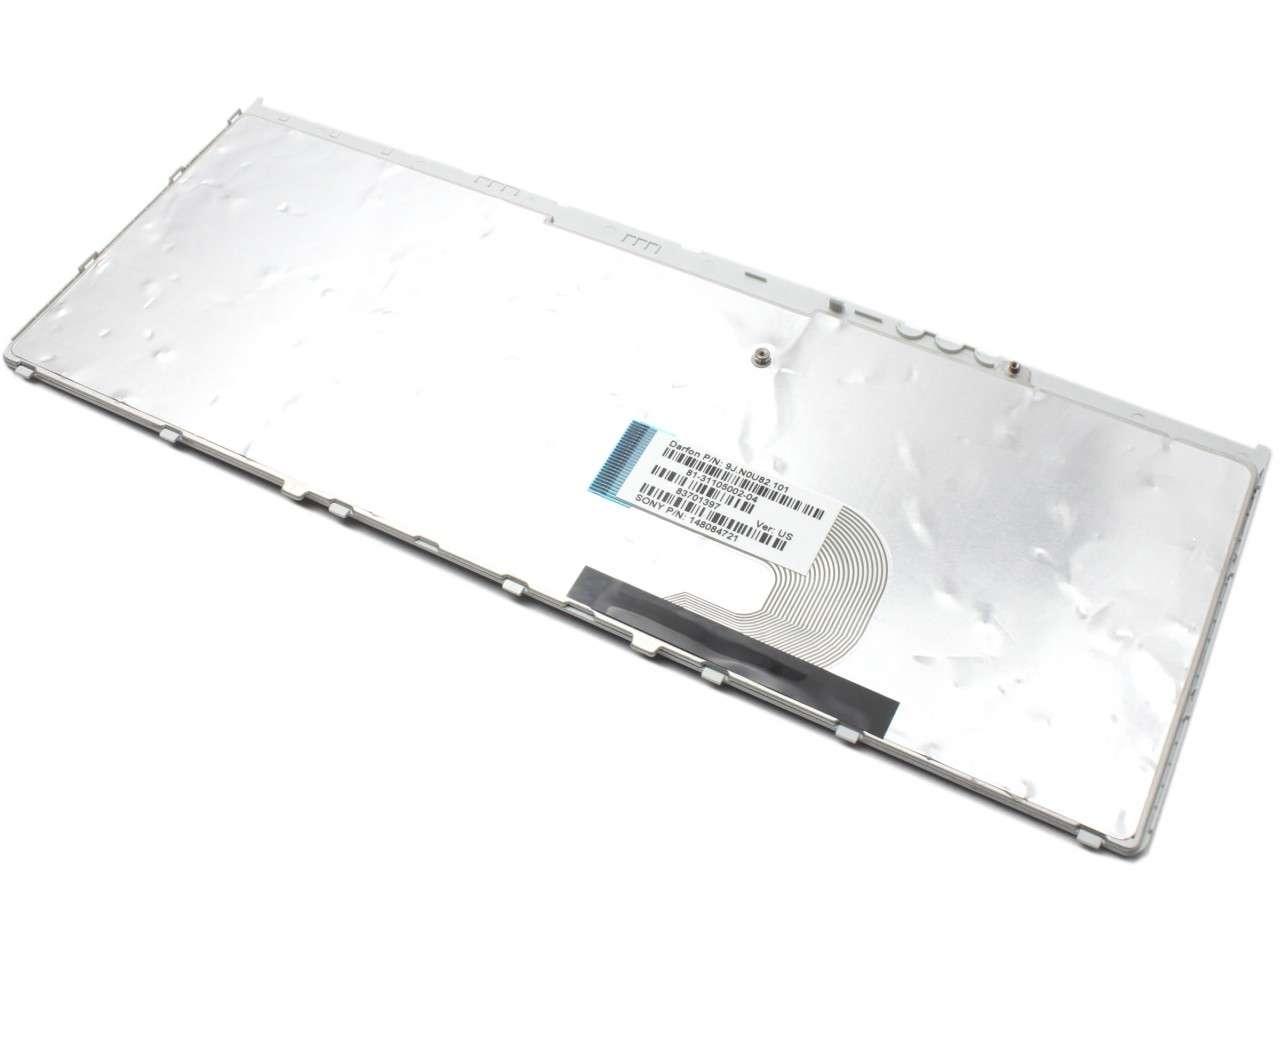 Tastatura Sony Vaio VGN-FW140EH neagra cu rama gri imagine powerlaptop.ro 2021